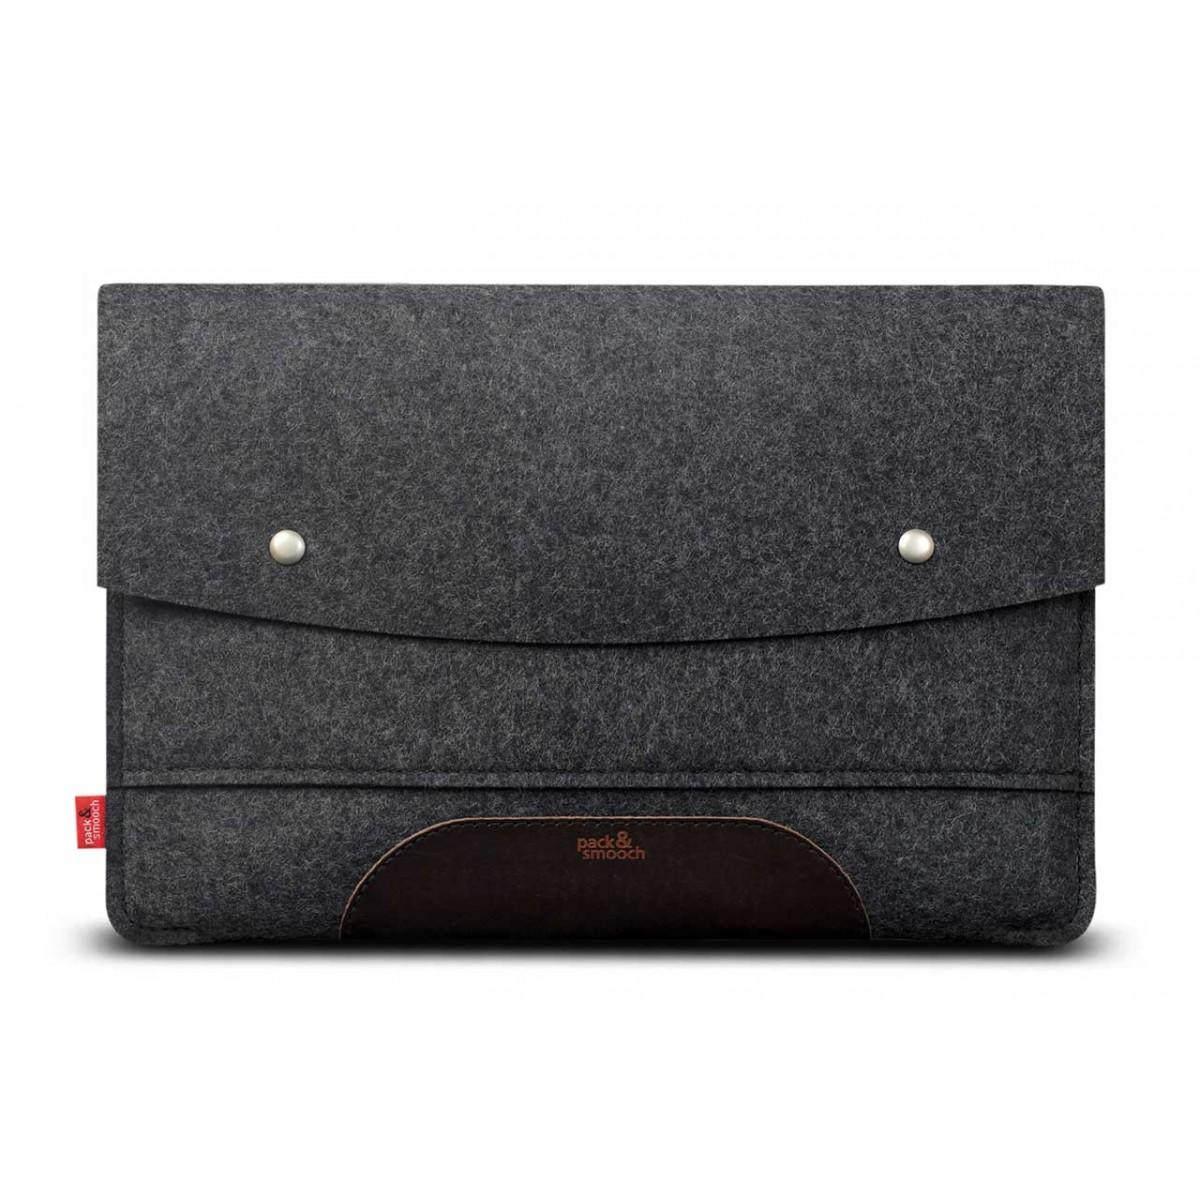 "Pack & Smooch iPad Pro 12.9"" (Vor Okt. 2018) Hülle, Sleeve HAMPSHIRE 100% Merino Wollfilz, Naturleder"